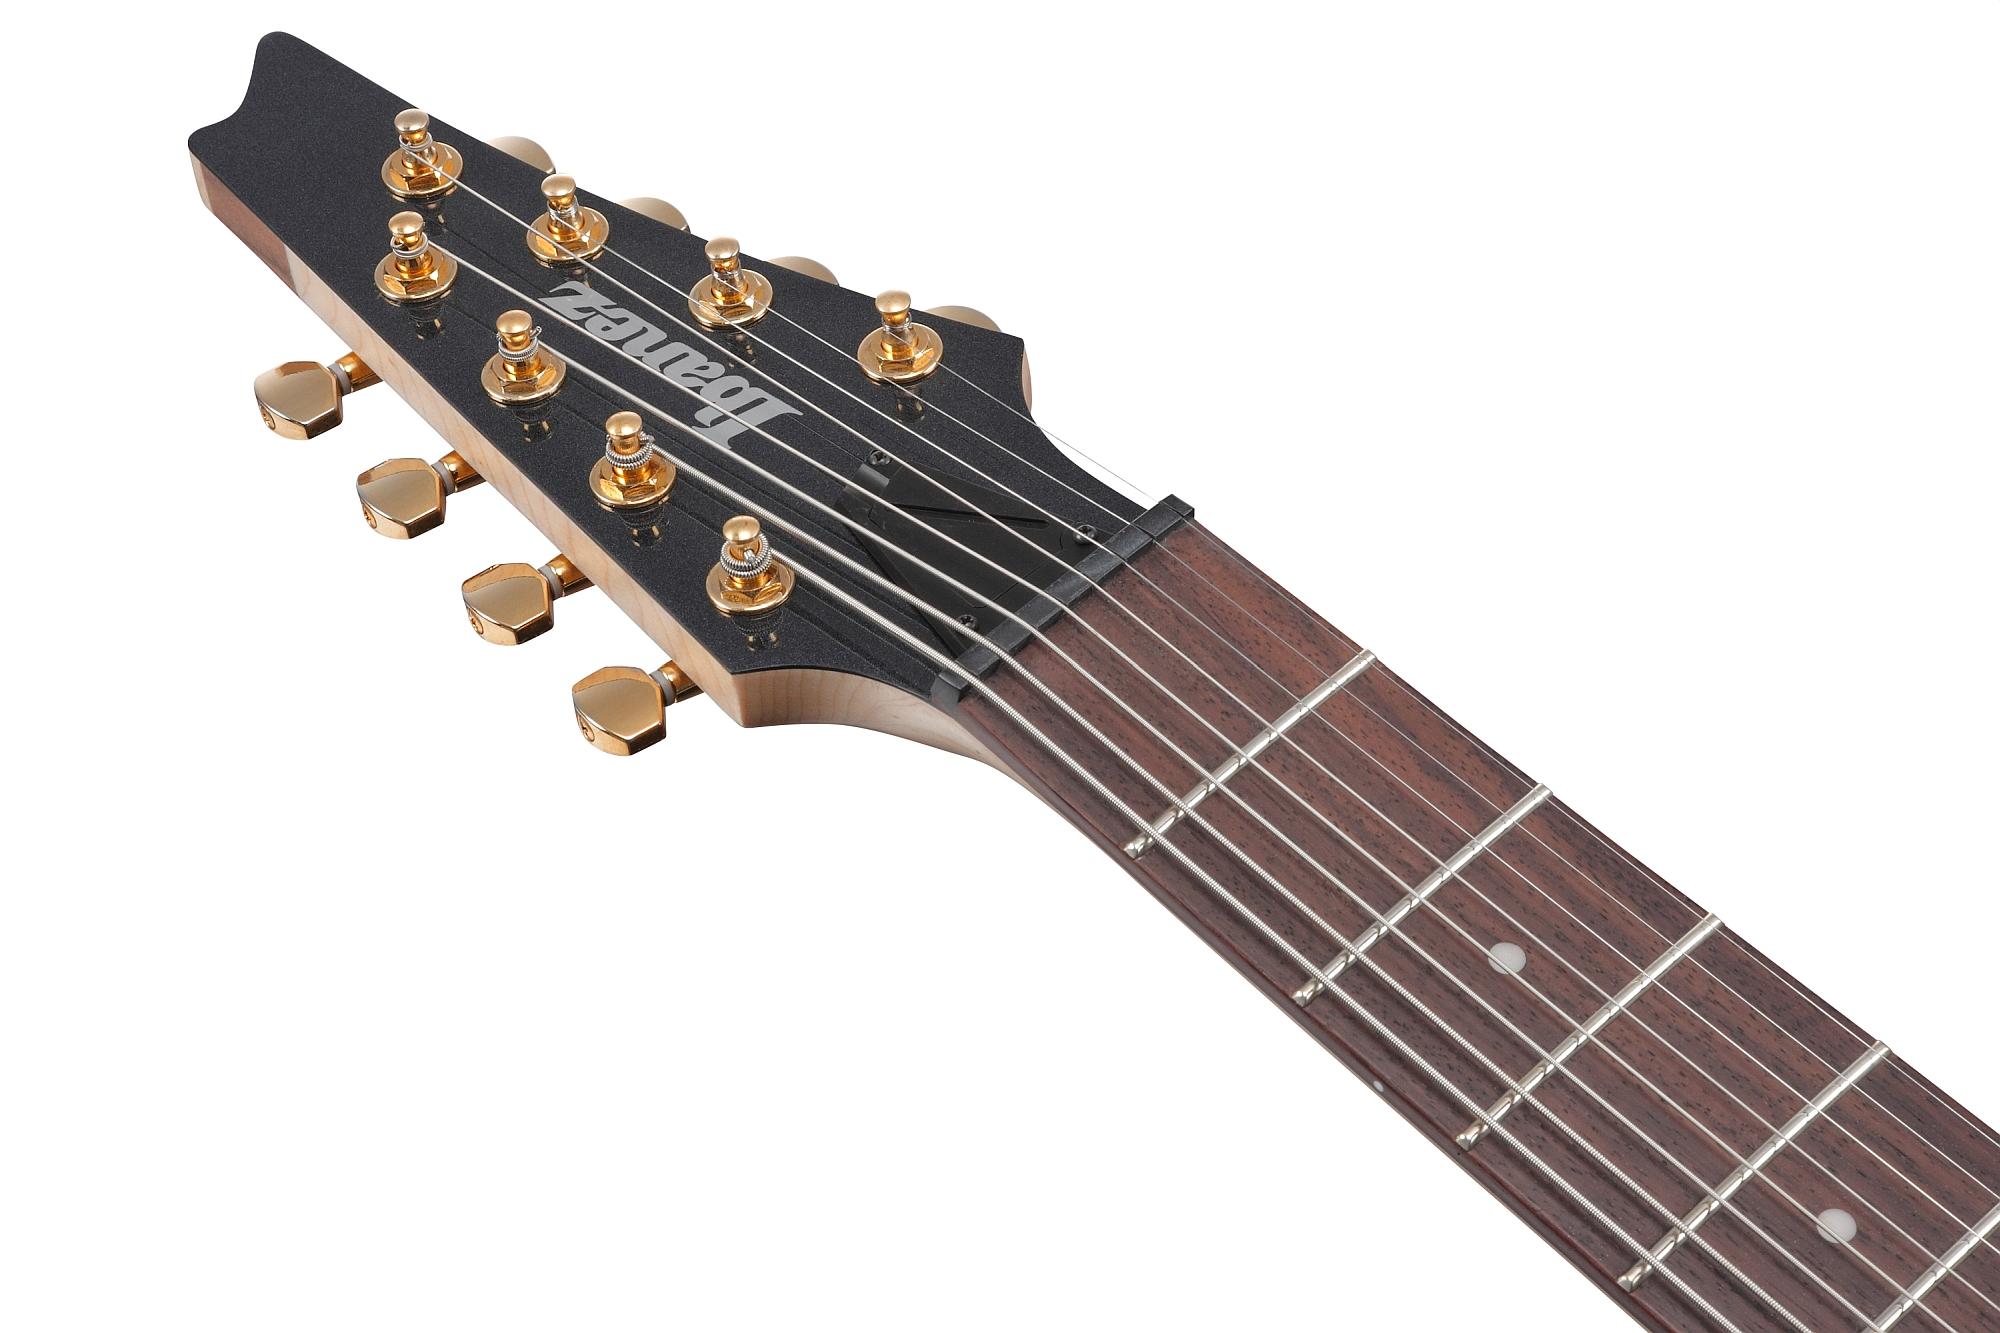 Ibanez RG80F-IPT 8-String - Iron Pewter